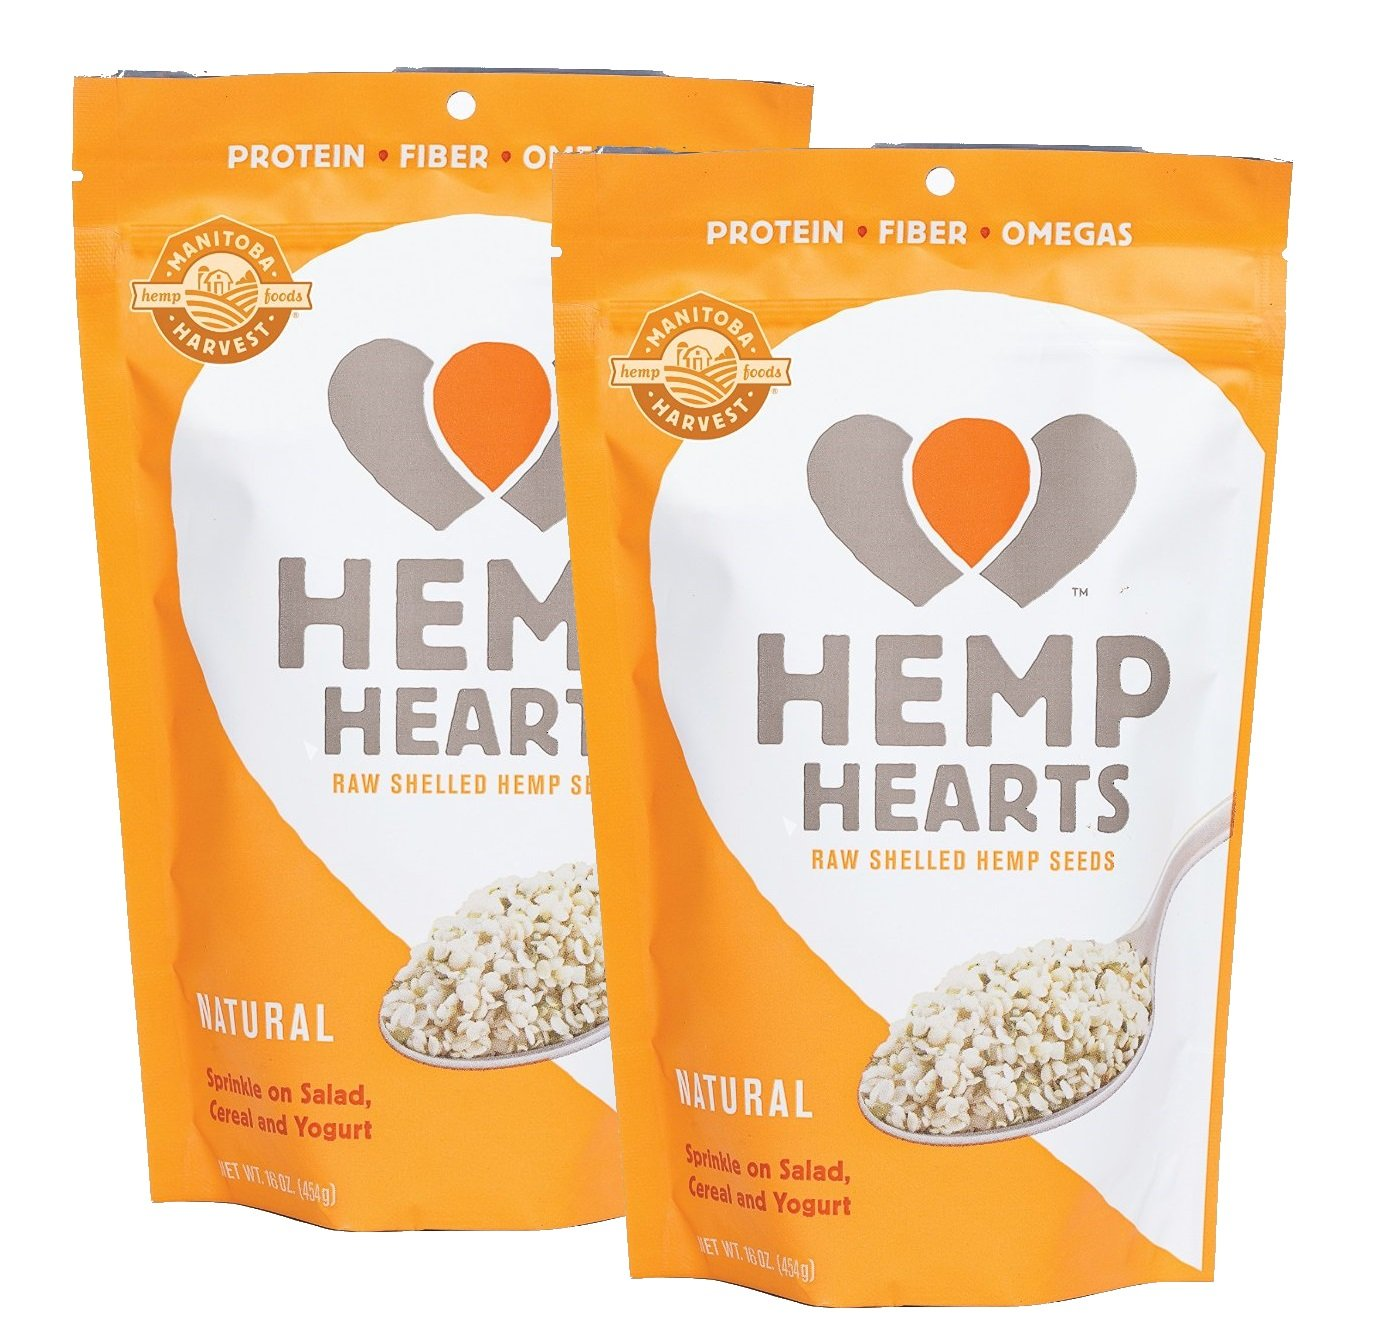 Manitoba Harvest Hemp Hearts Raw Shelled Hemp Seeds, Natural, 2 Pounds